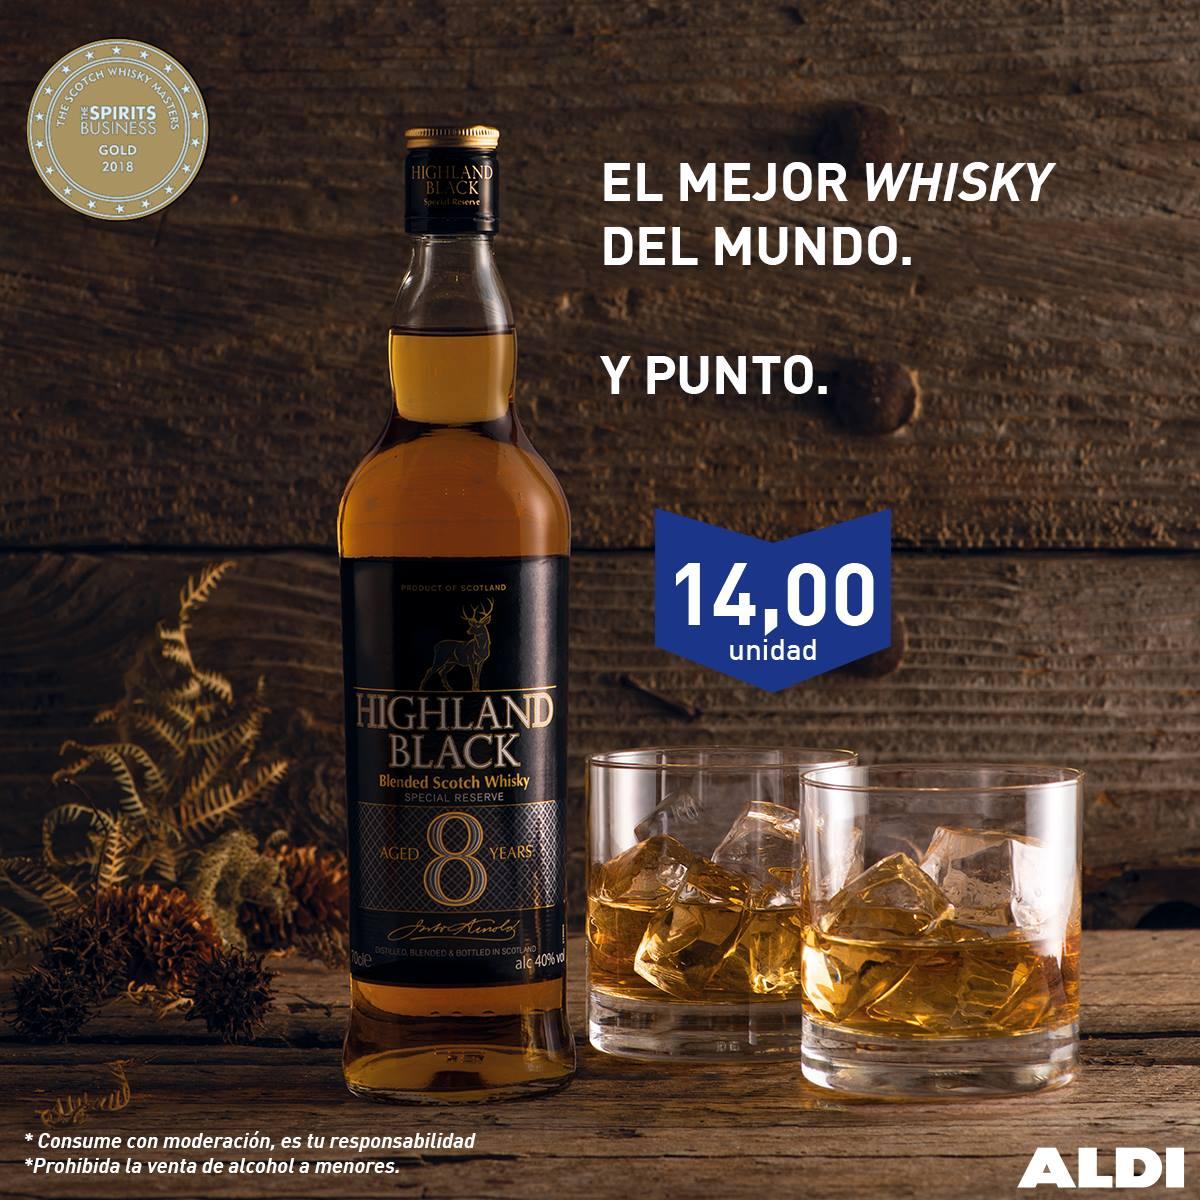 whisky aldi mejor mundo - Whisky Aldi, el mejor del mundo